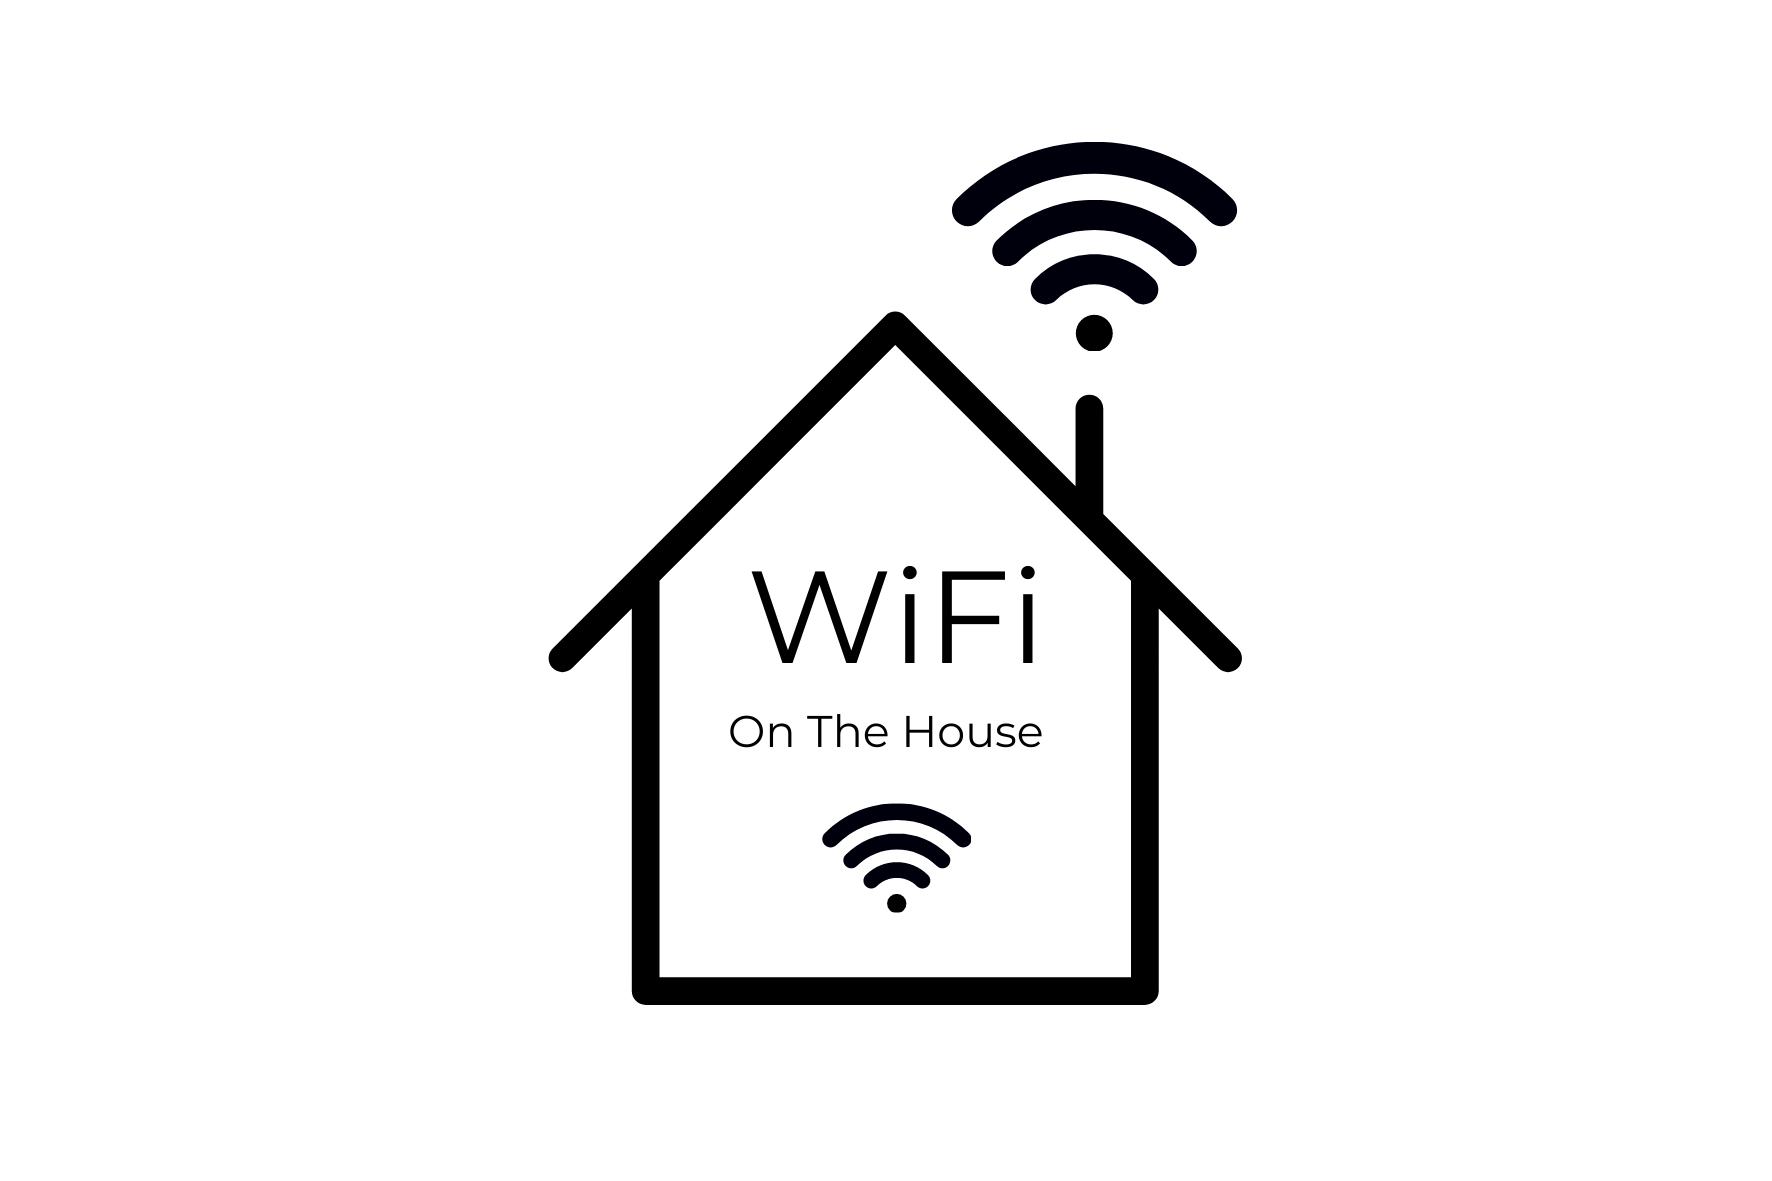 Wifi on the House